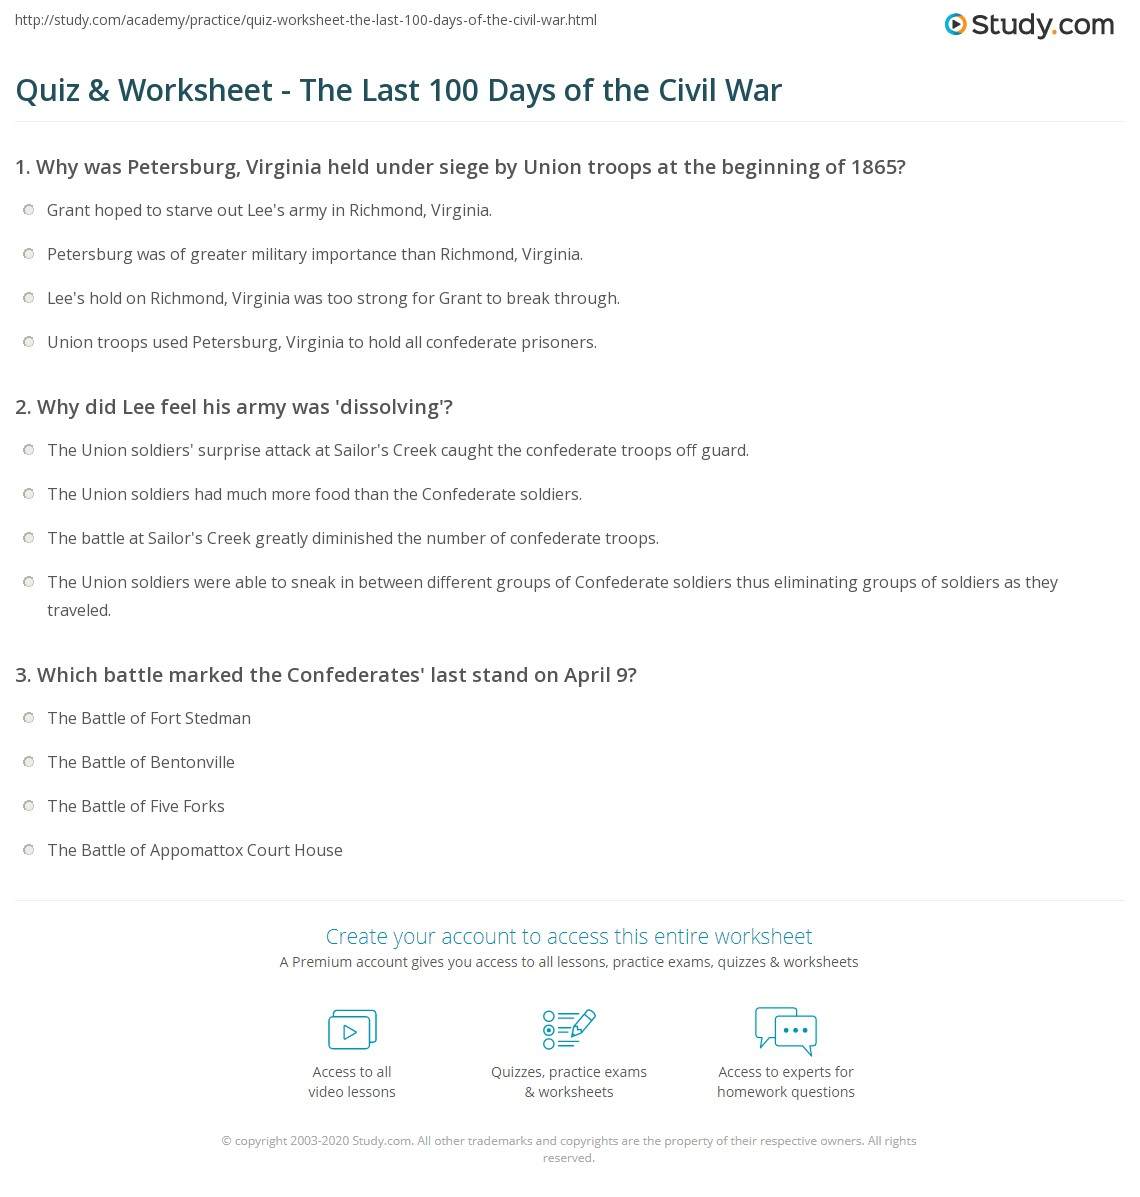 Quiz Worksheet The Last 100 Days Of The Civil War